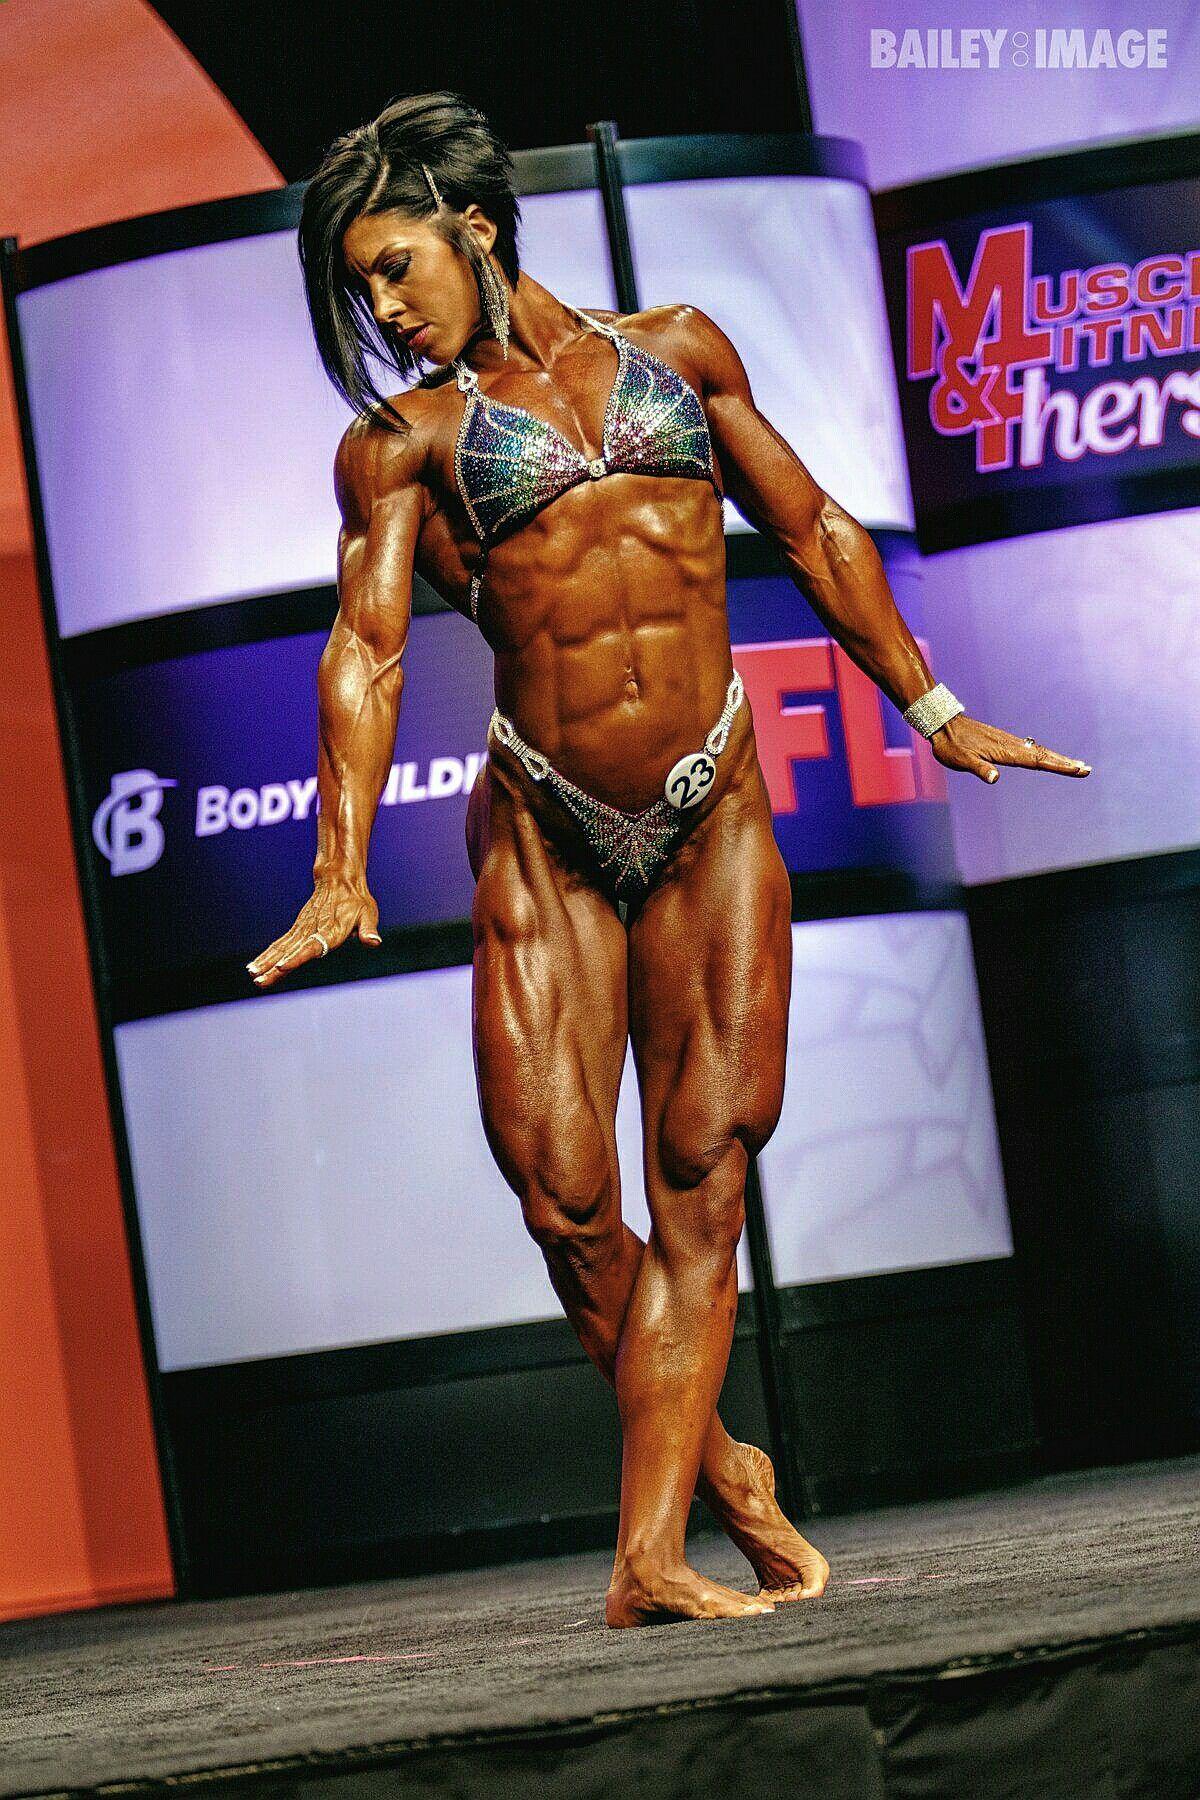 Дана линн бейли: самая популярная ifbb pro physique